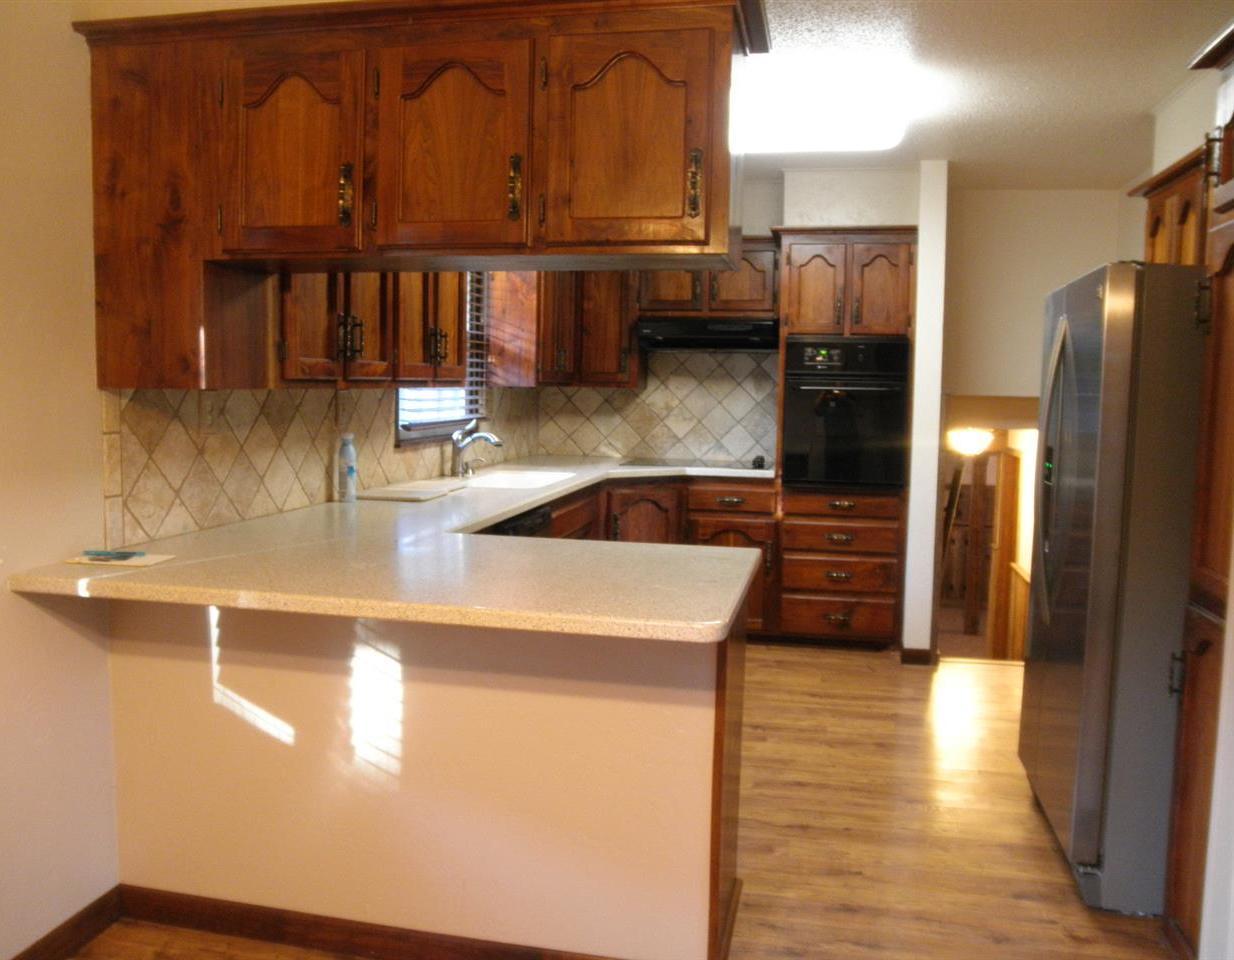 Sold Cross Sale W/ MLS | 4251 E Hubbs Estate Road  Ponca City, OK 74604 6